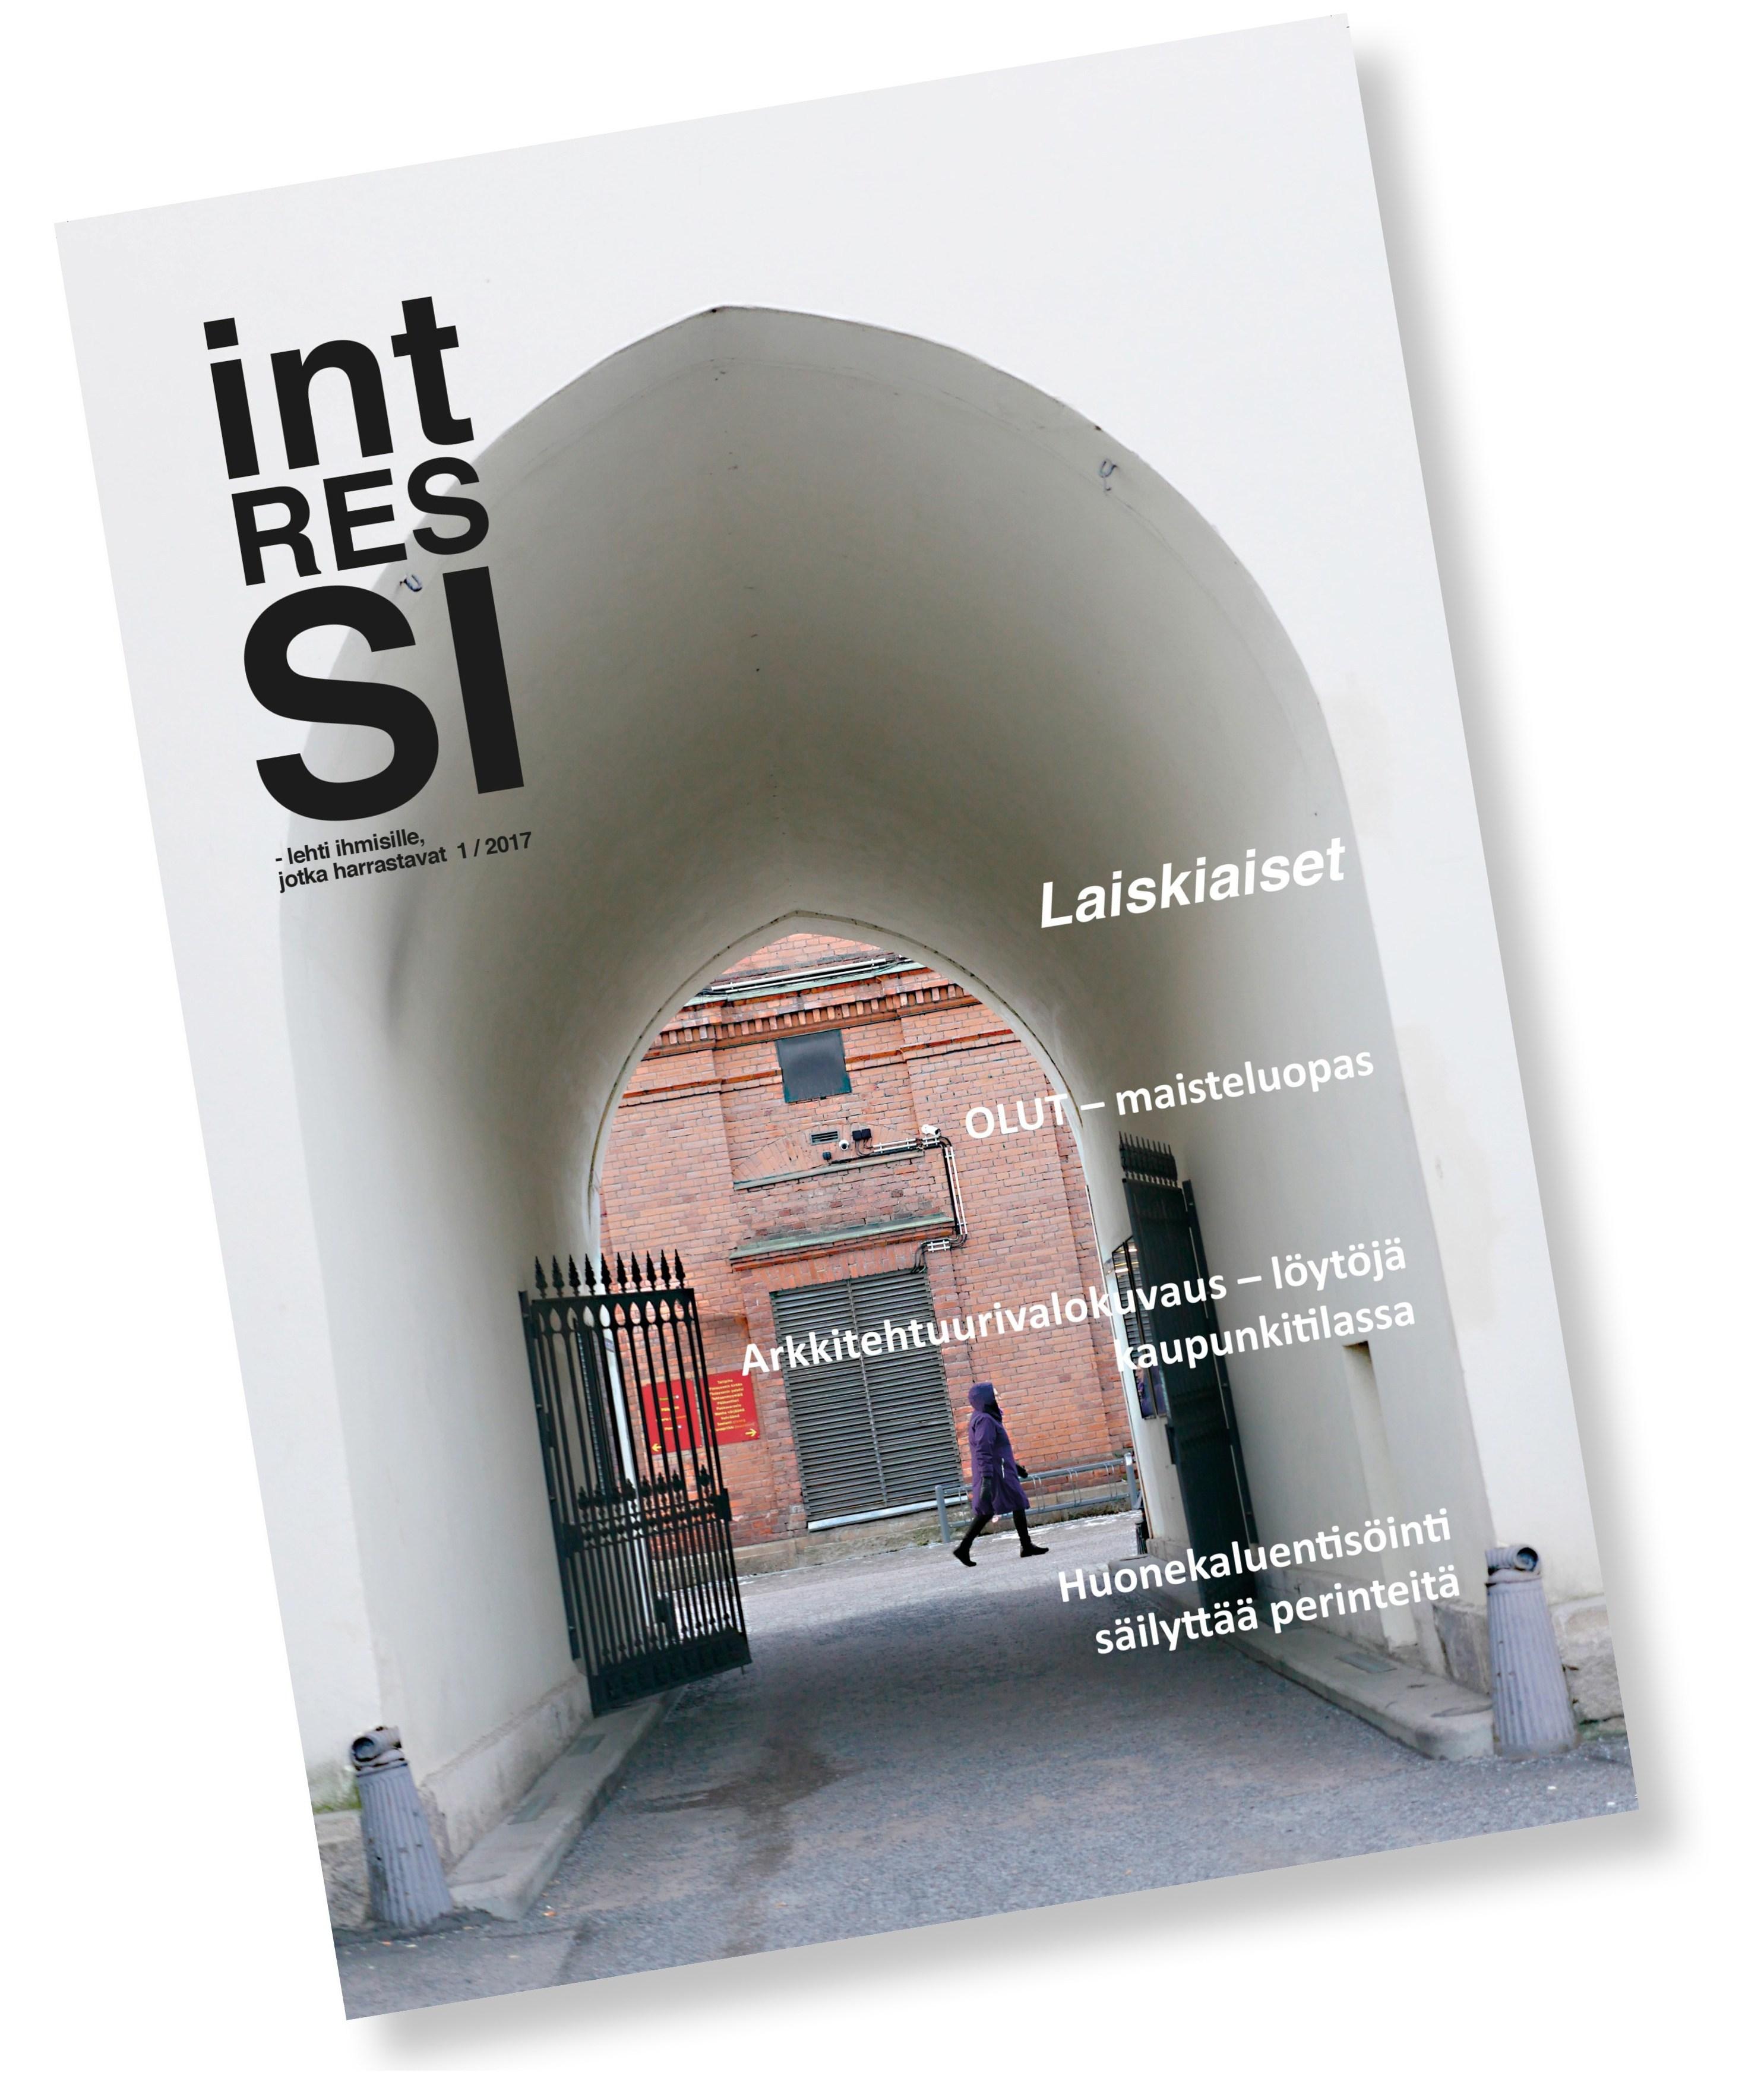 intressi-kansi1-e1546012701219.jpg